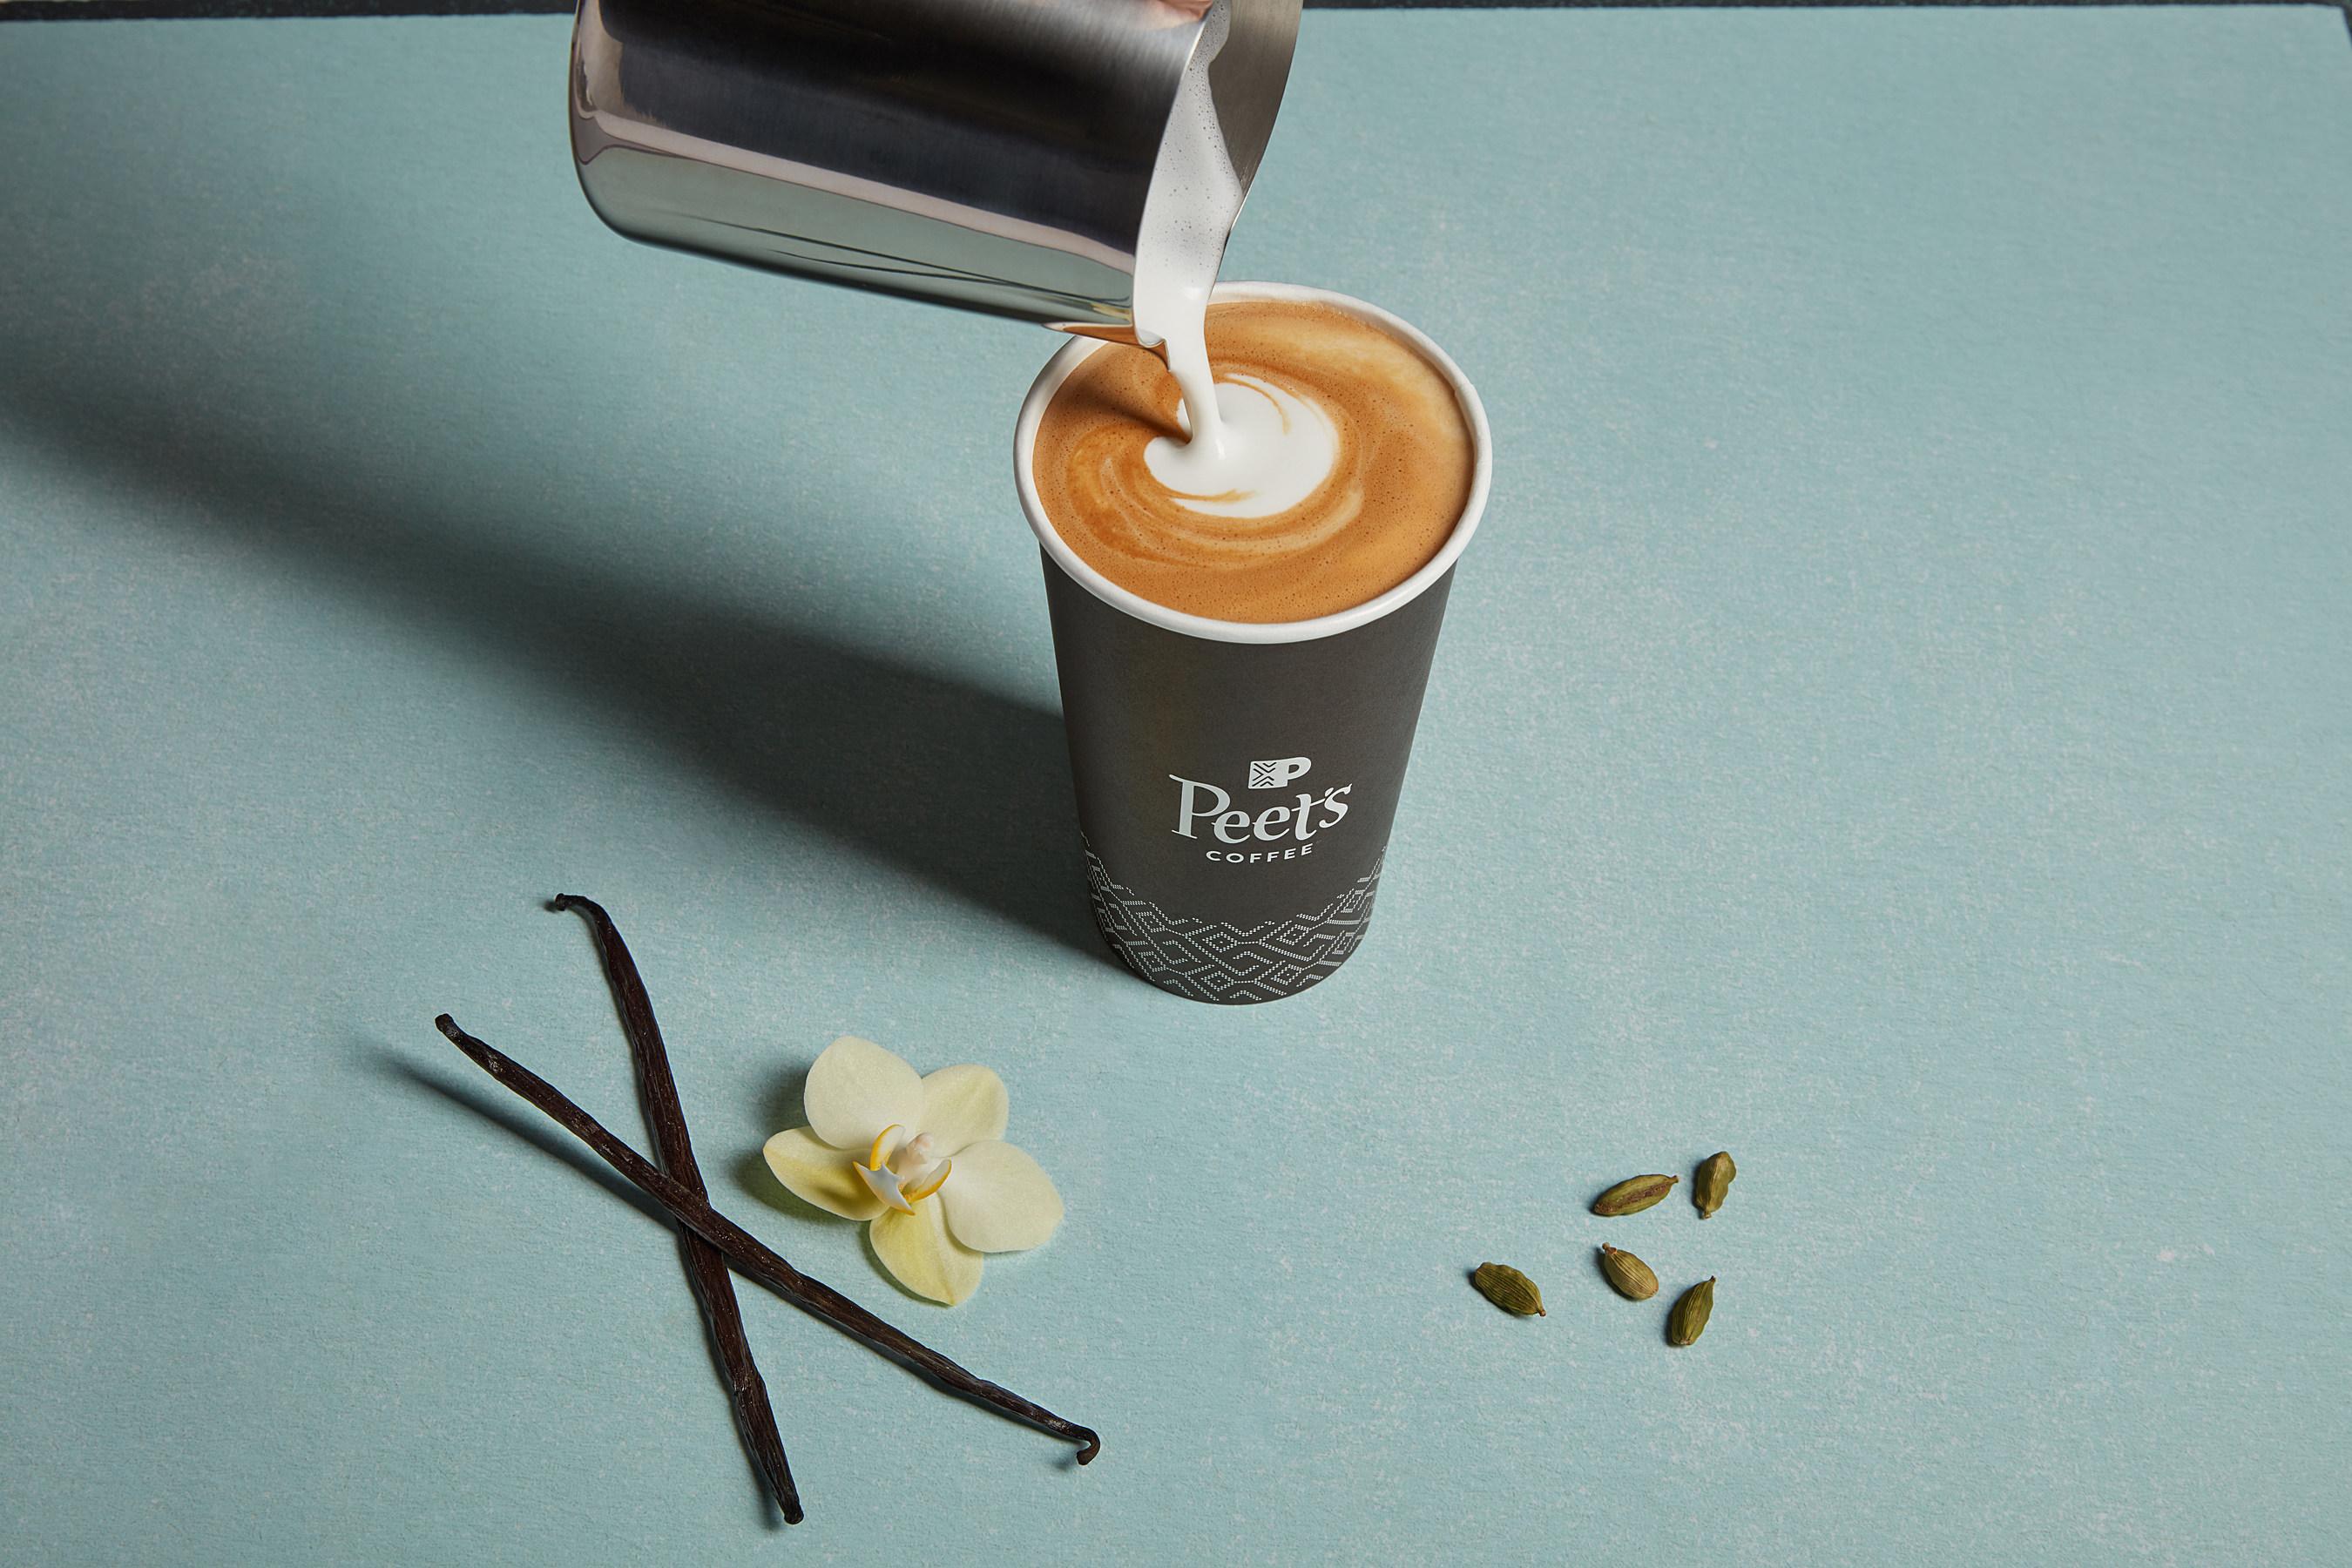 Peet's Coffee Embraces Fall Feelings